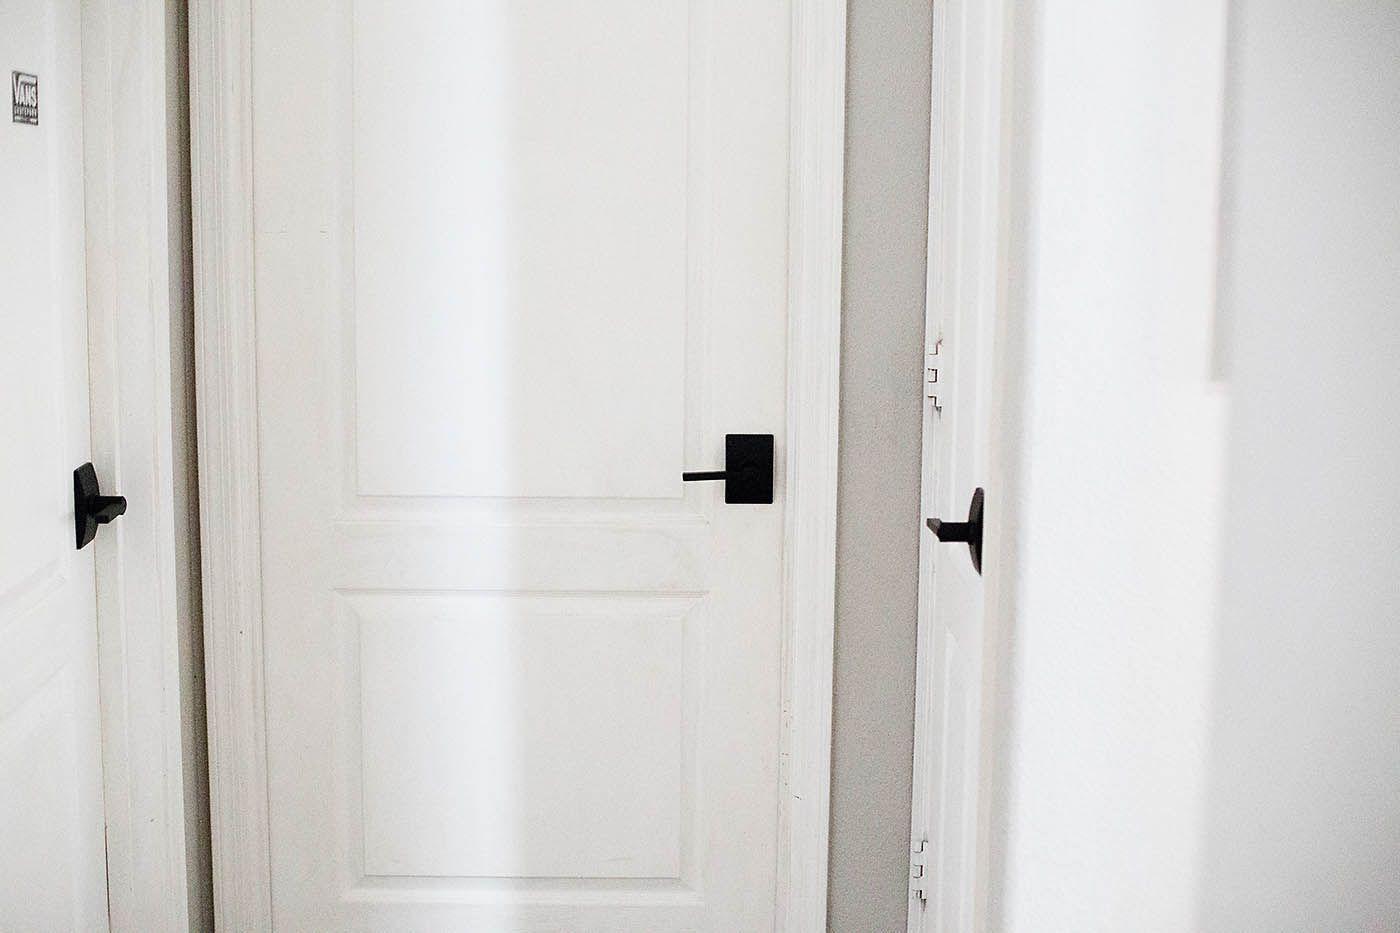 New Black Schlage Interior Doors